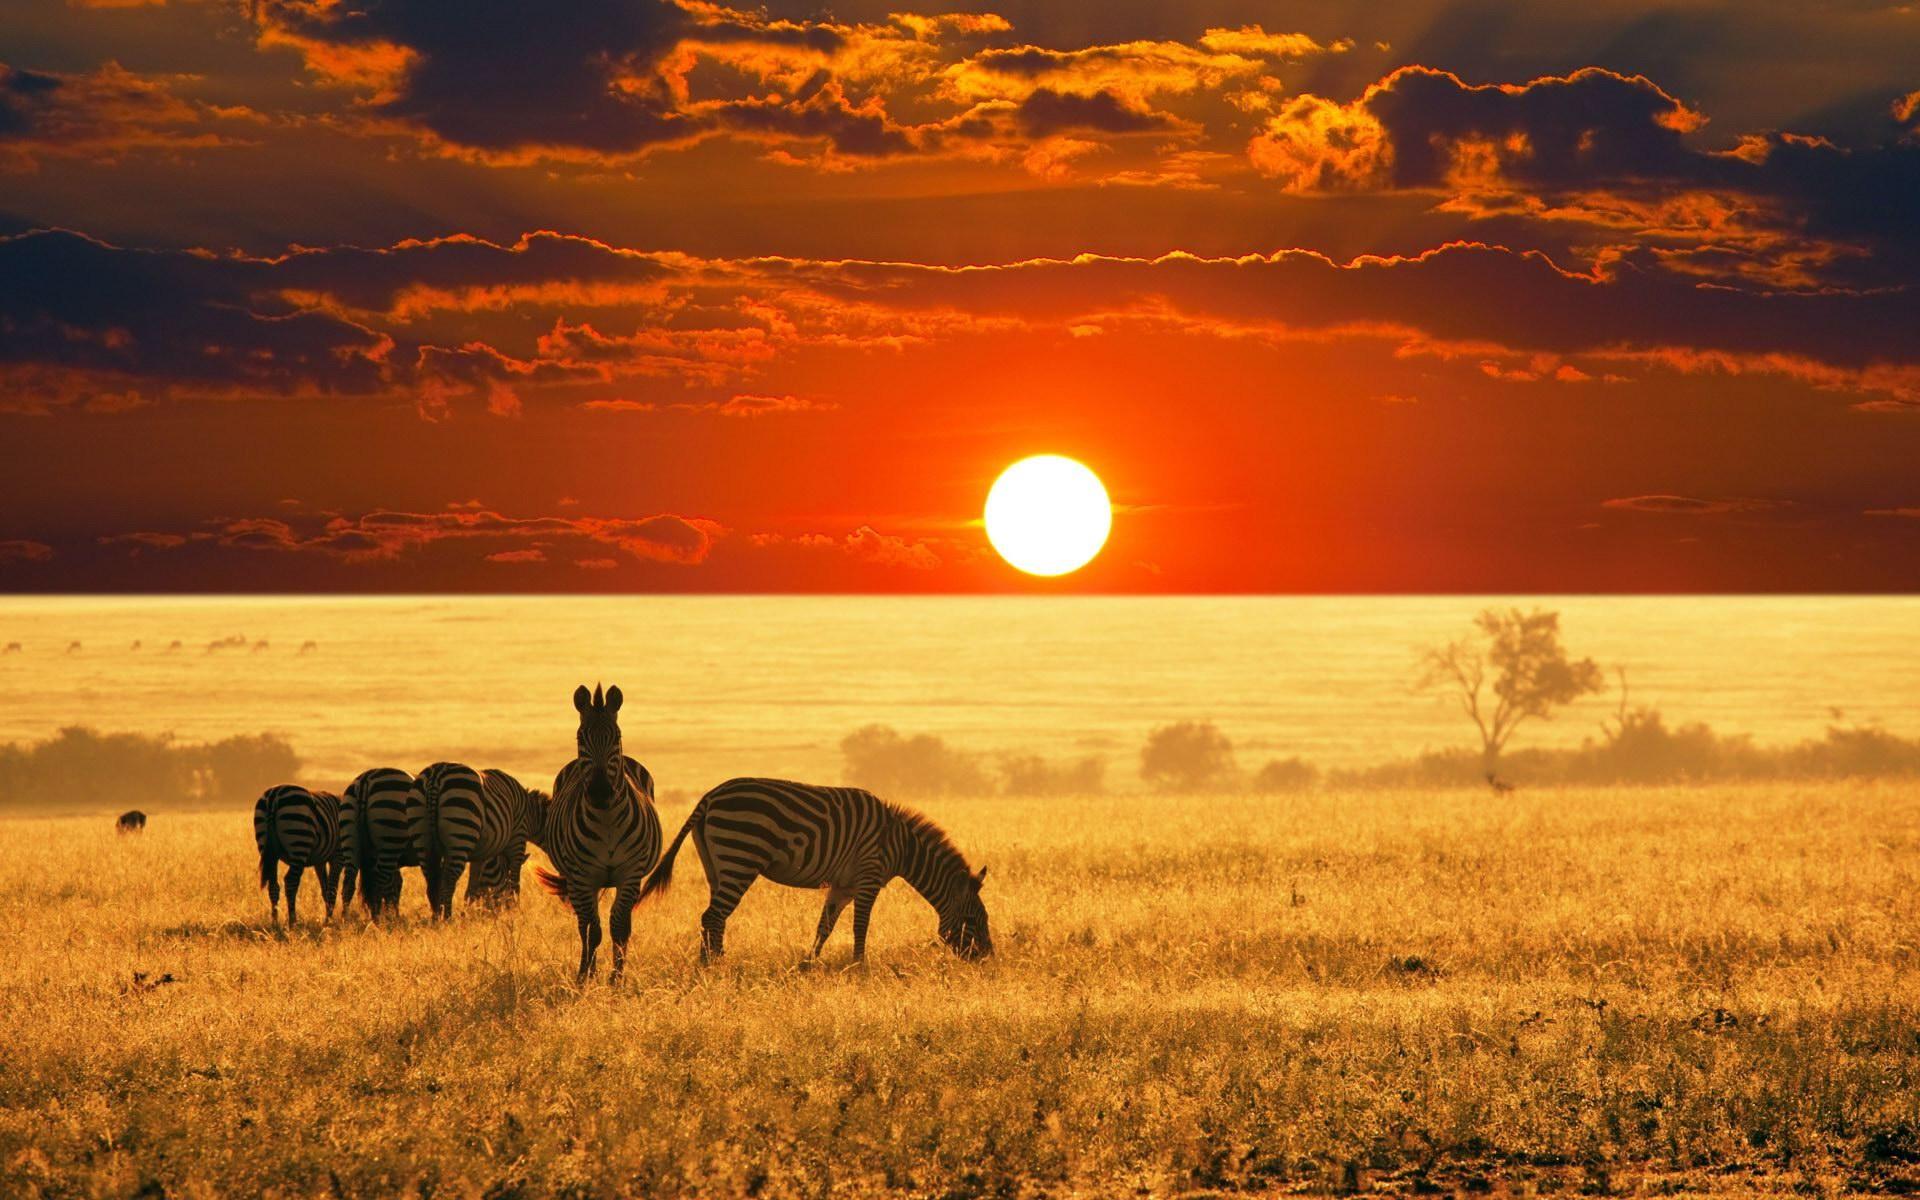 tramonti-paesaggi-natura-animali-fotografia-zebre-africa